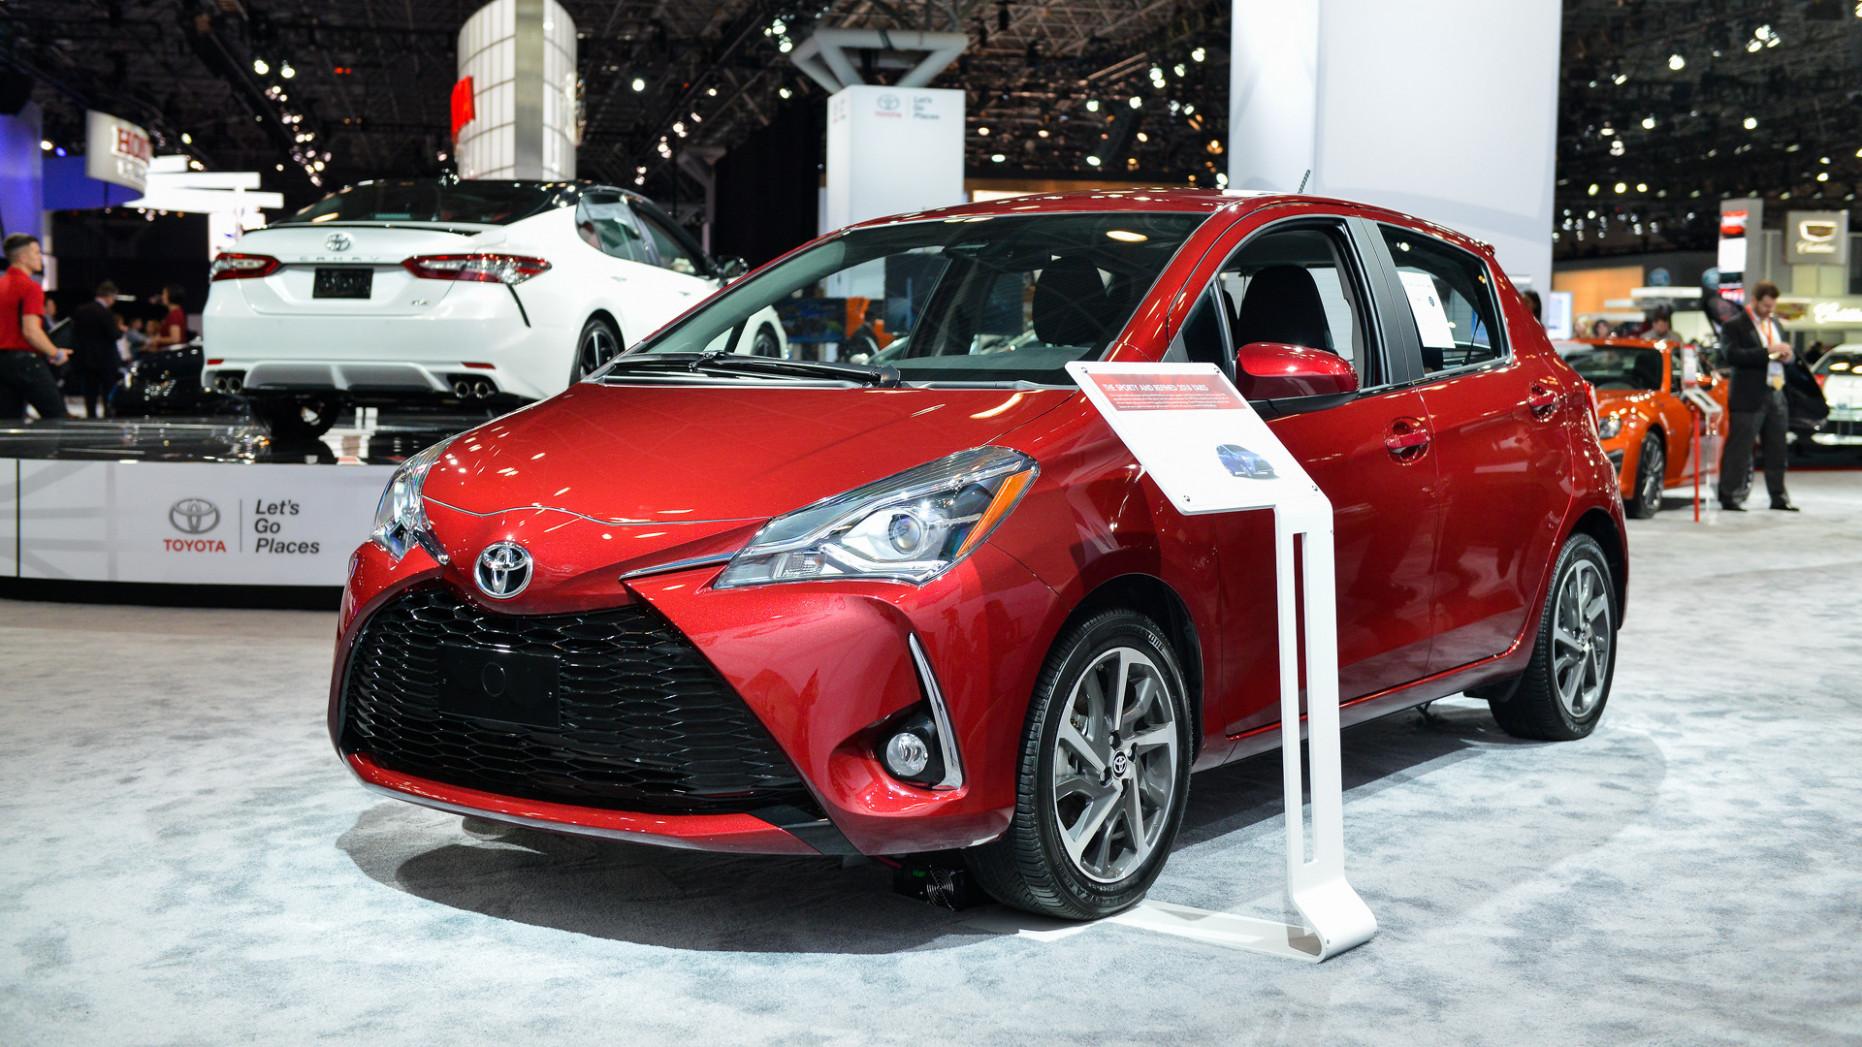 Release 2022 Toyota Yaris